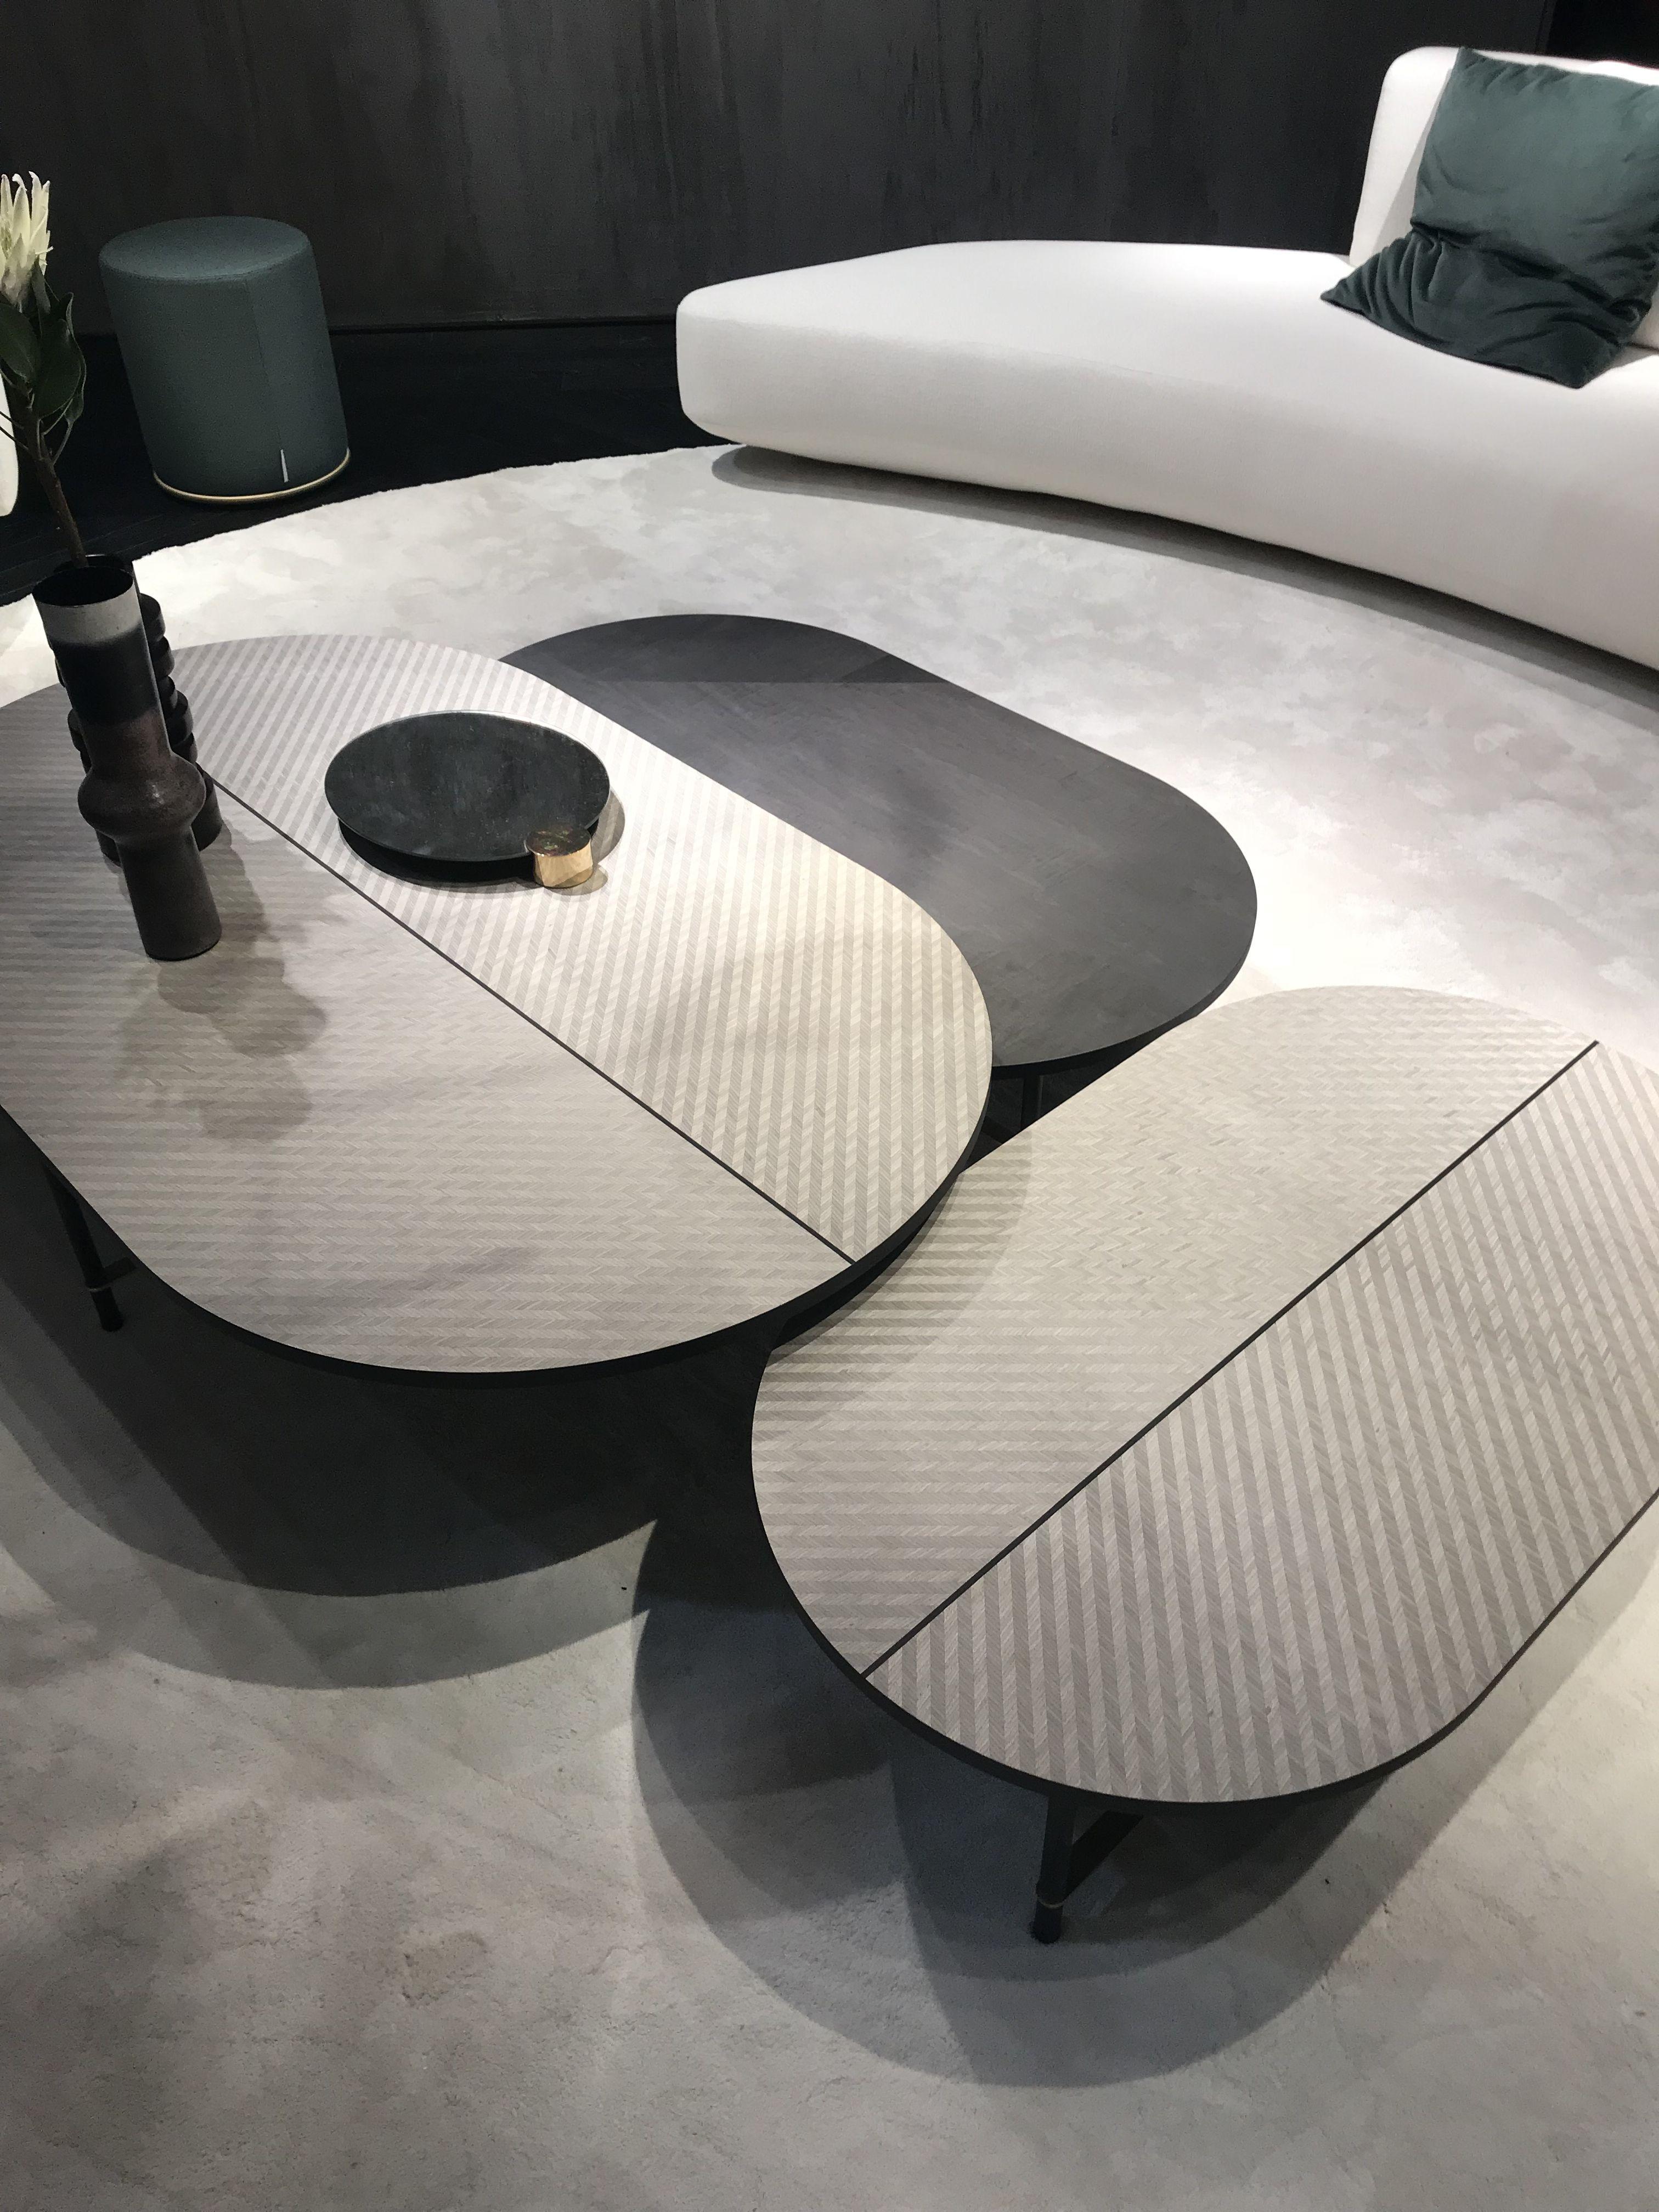 11 Delicate Contemporary Bathroom Concrete Ideas Coffee Table Furniture Design Modern Contemporary Interior